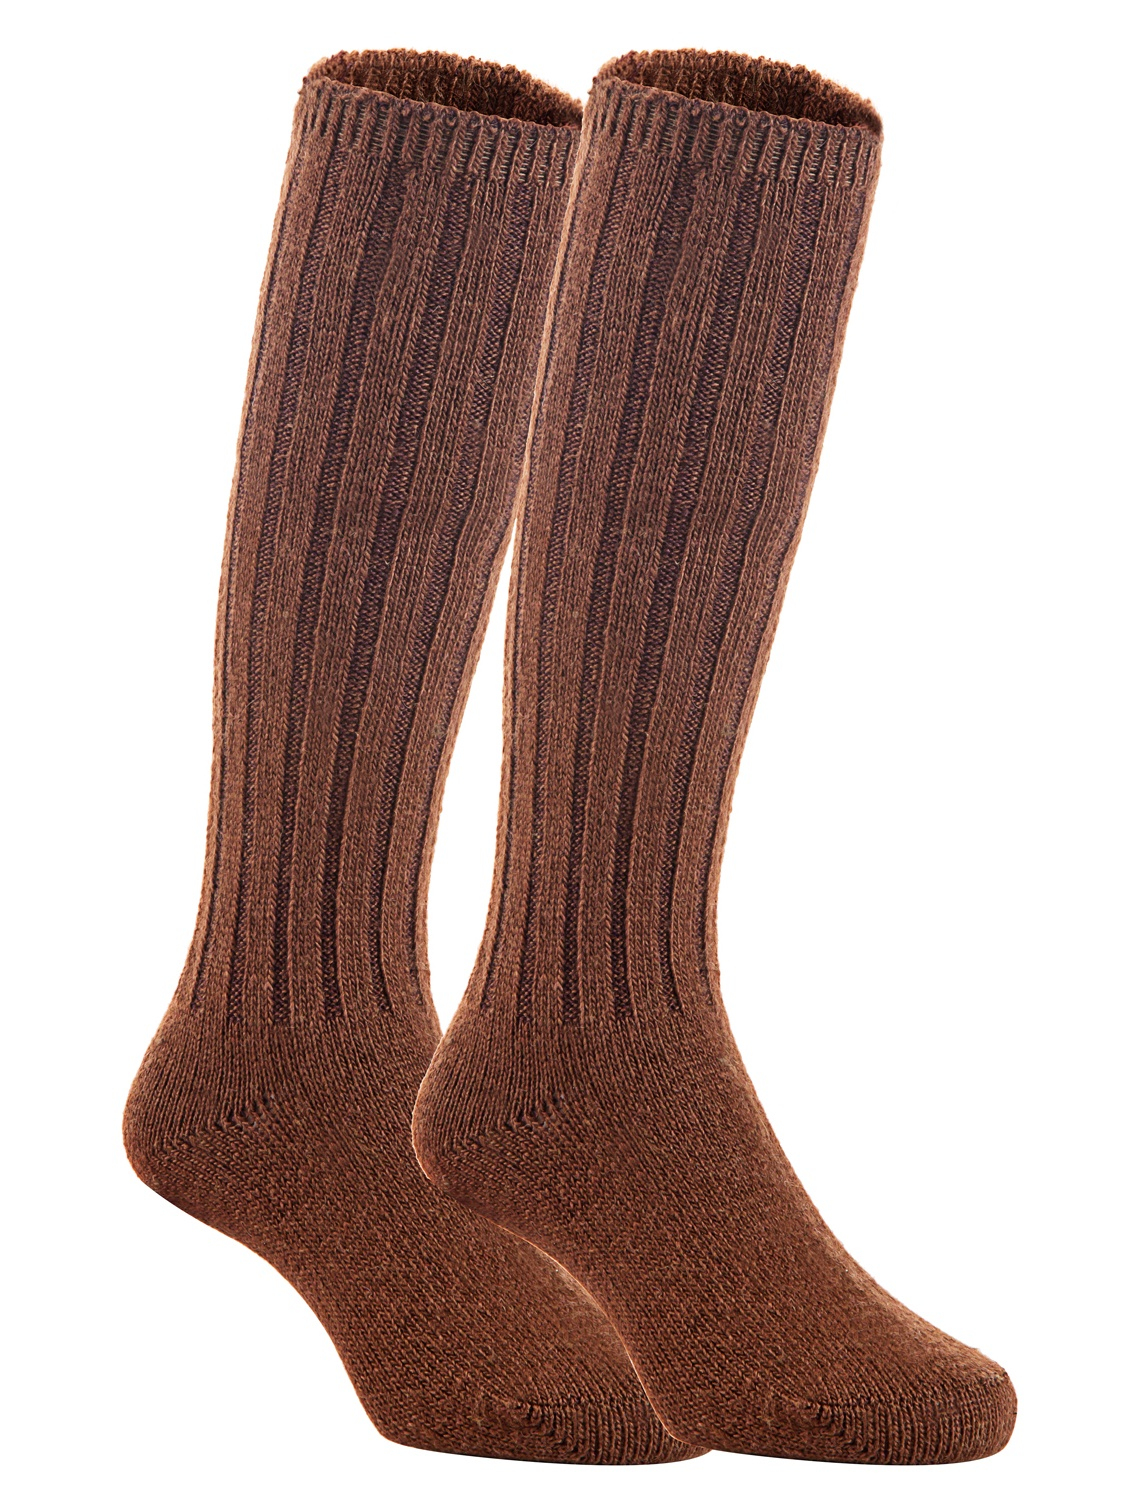 Lian LifeStyle Children 6 Pairs Knee High Wool Socks 3 Sizes 13 Colors Boy